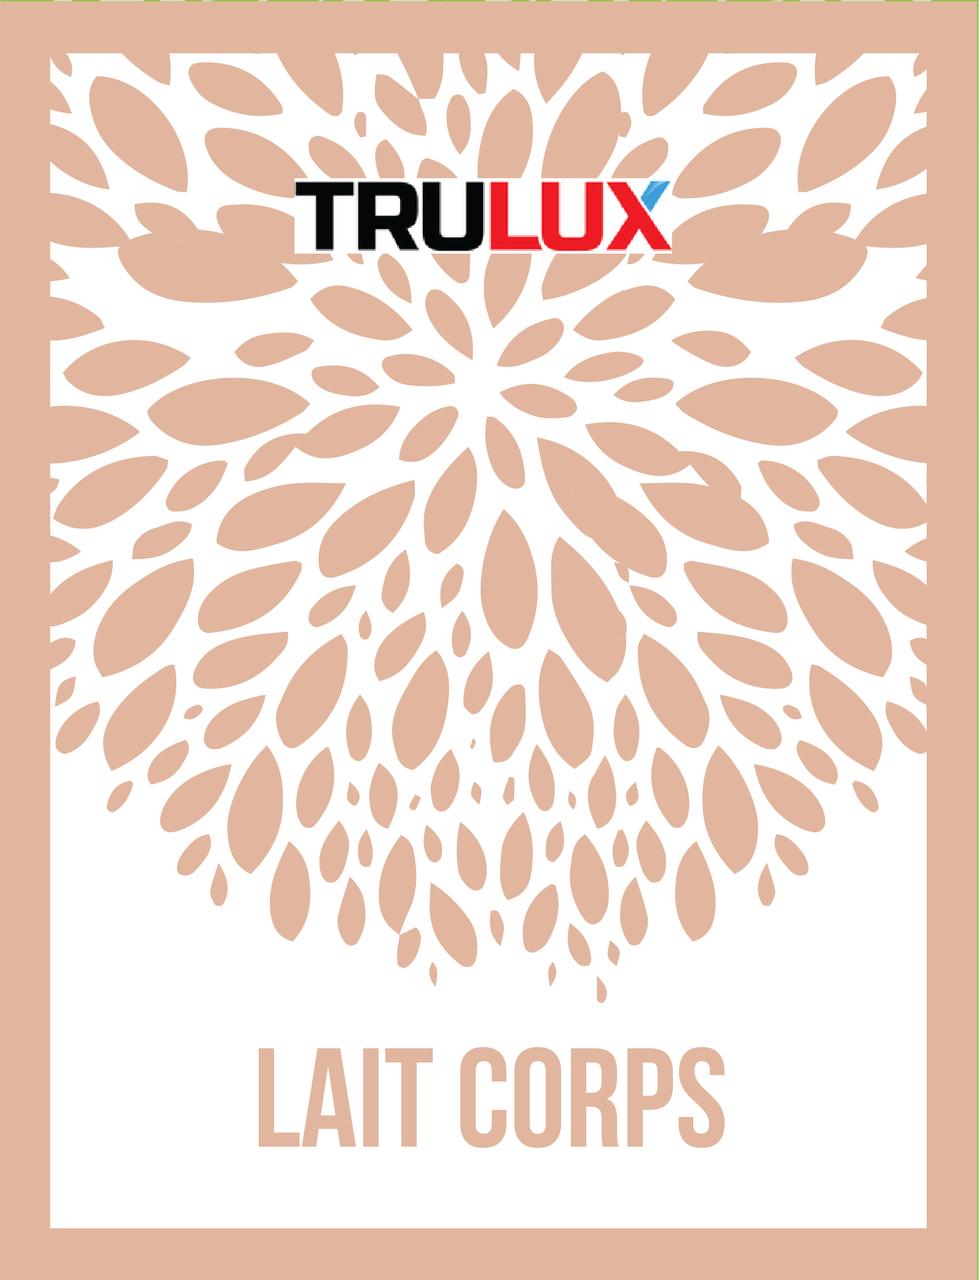 LAIT CORPS (BODY LOTION)